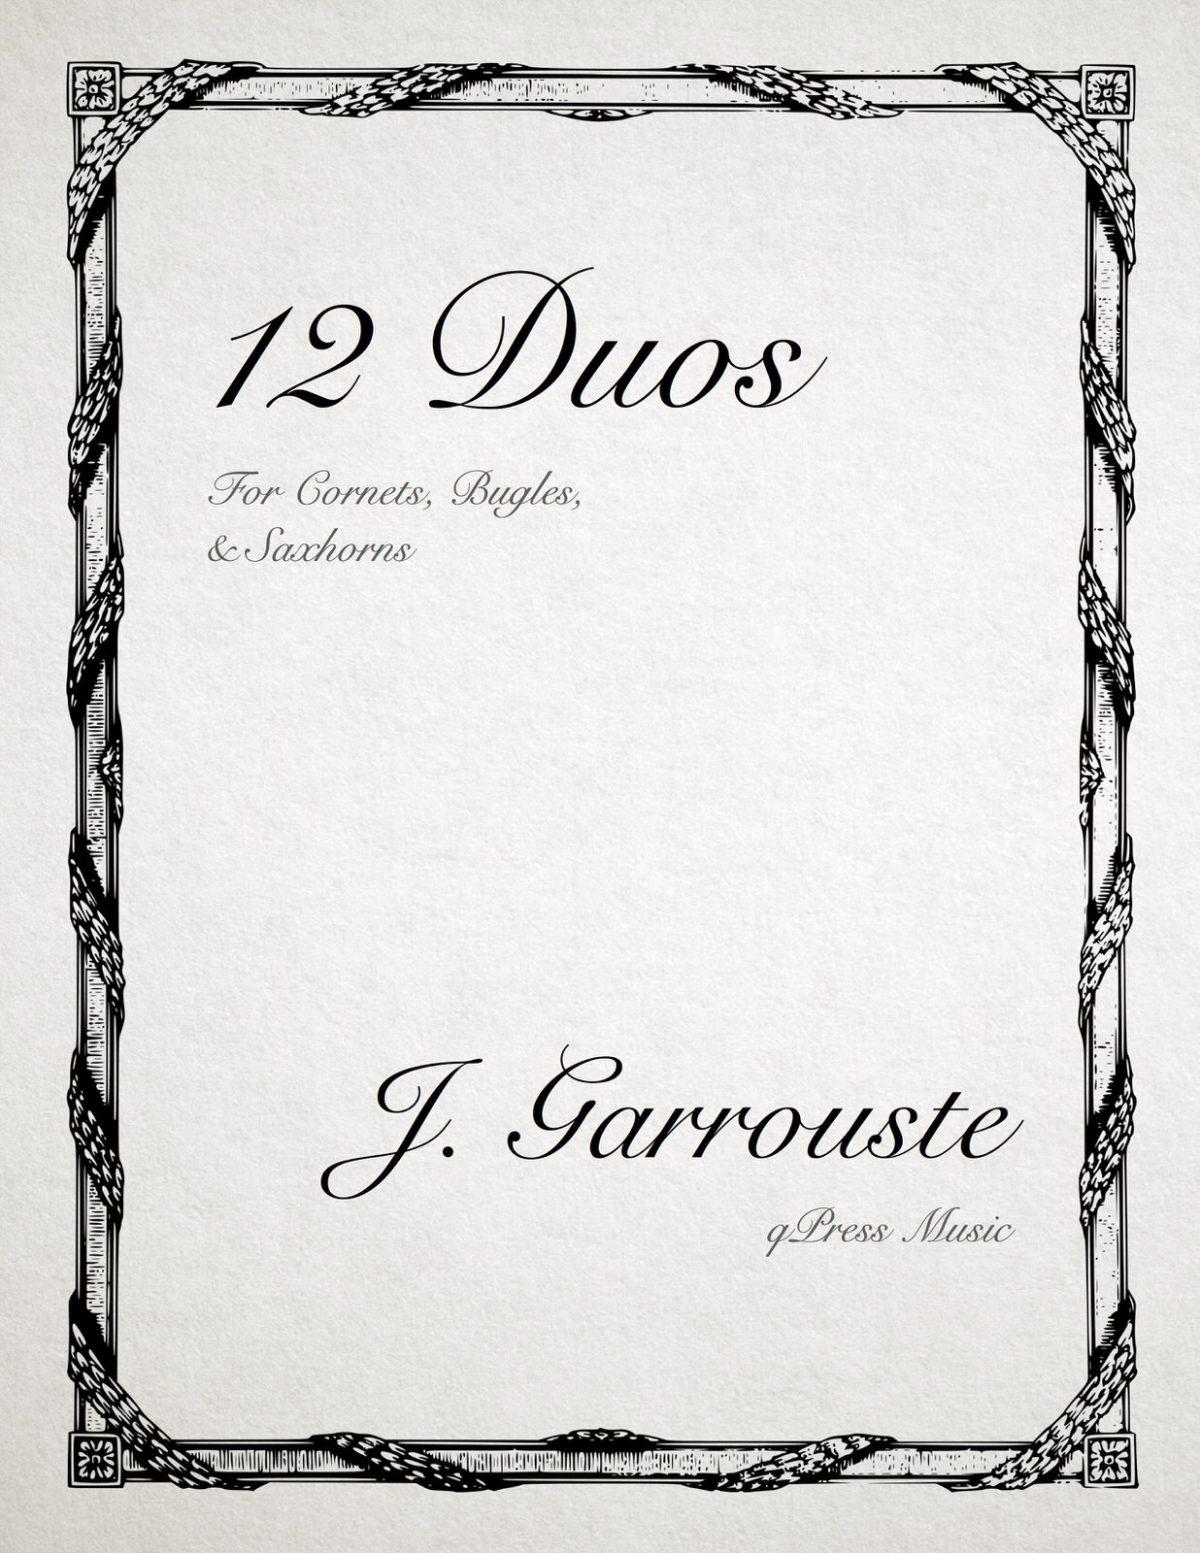 Garrouste, 12 Duos